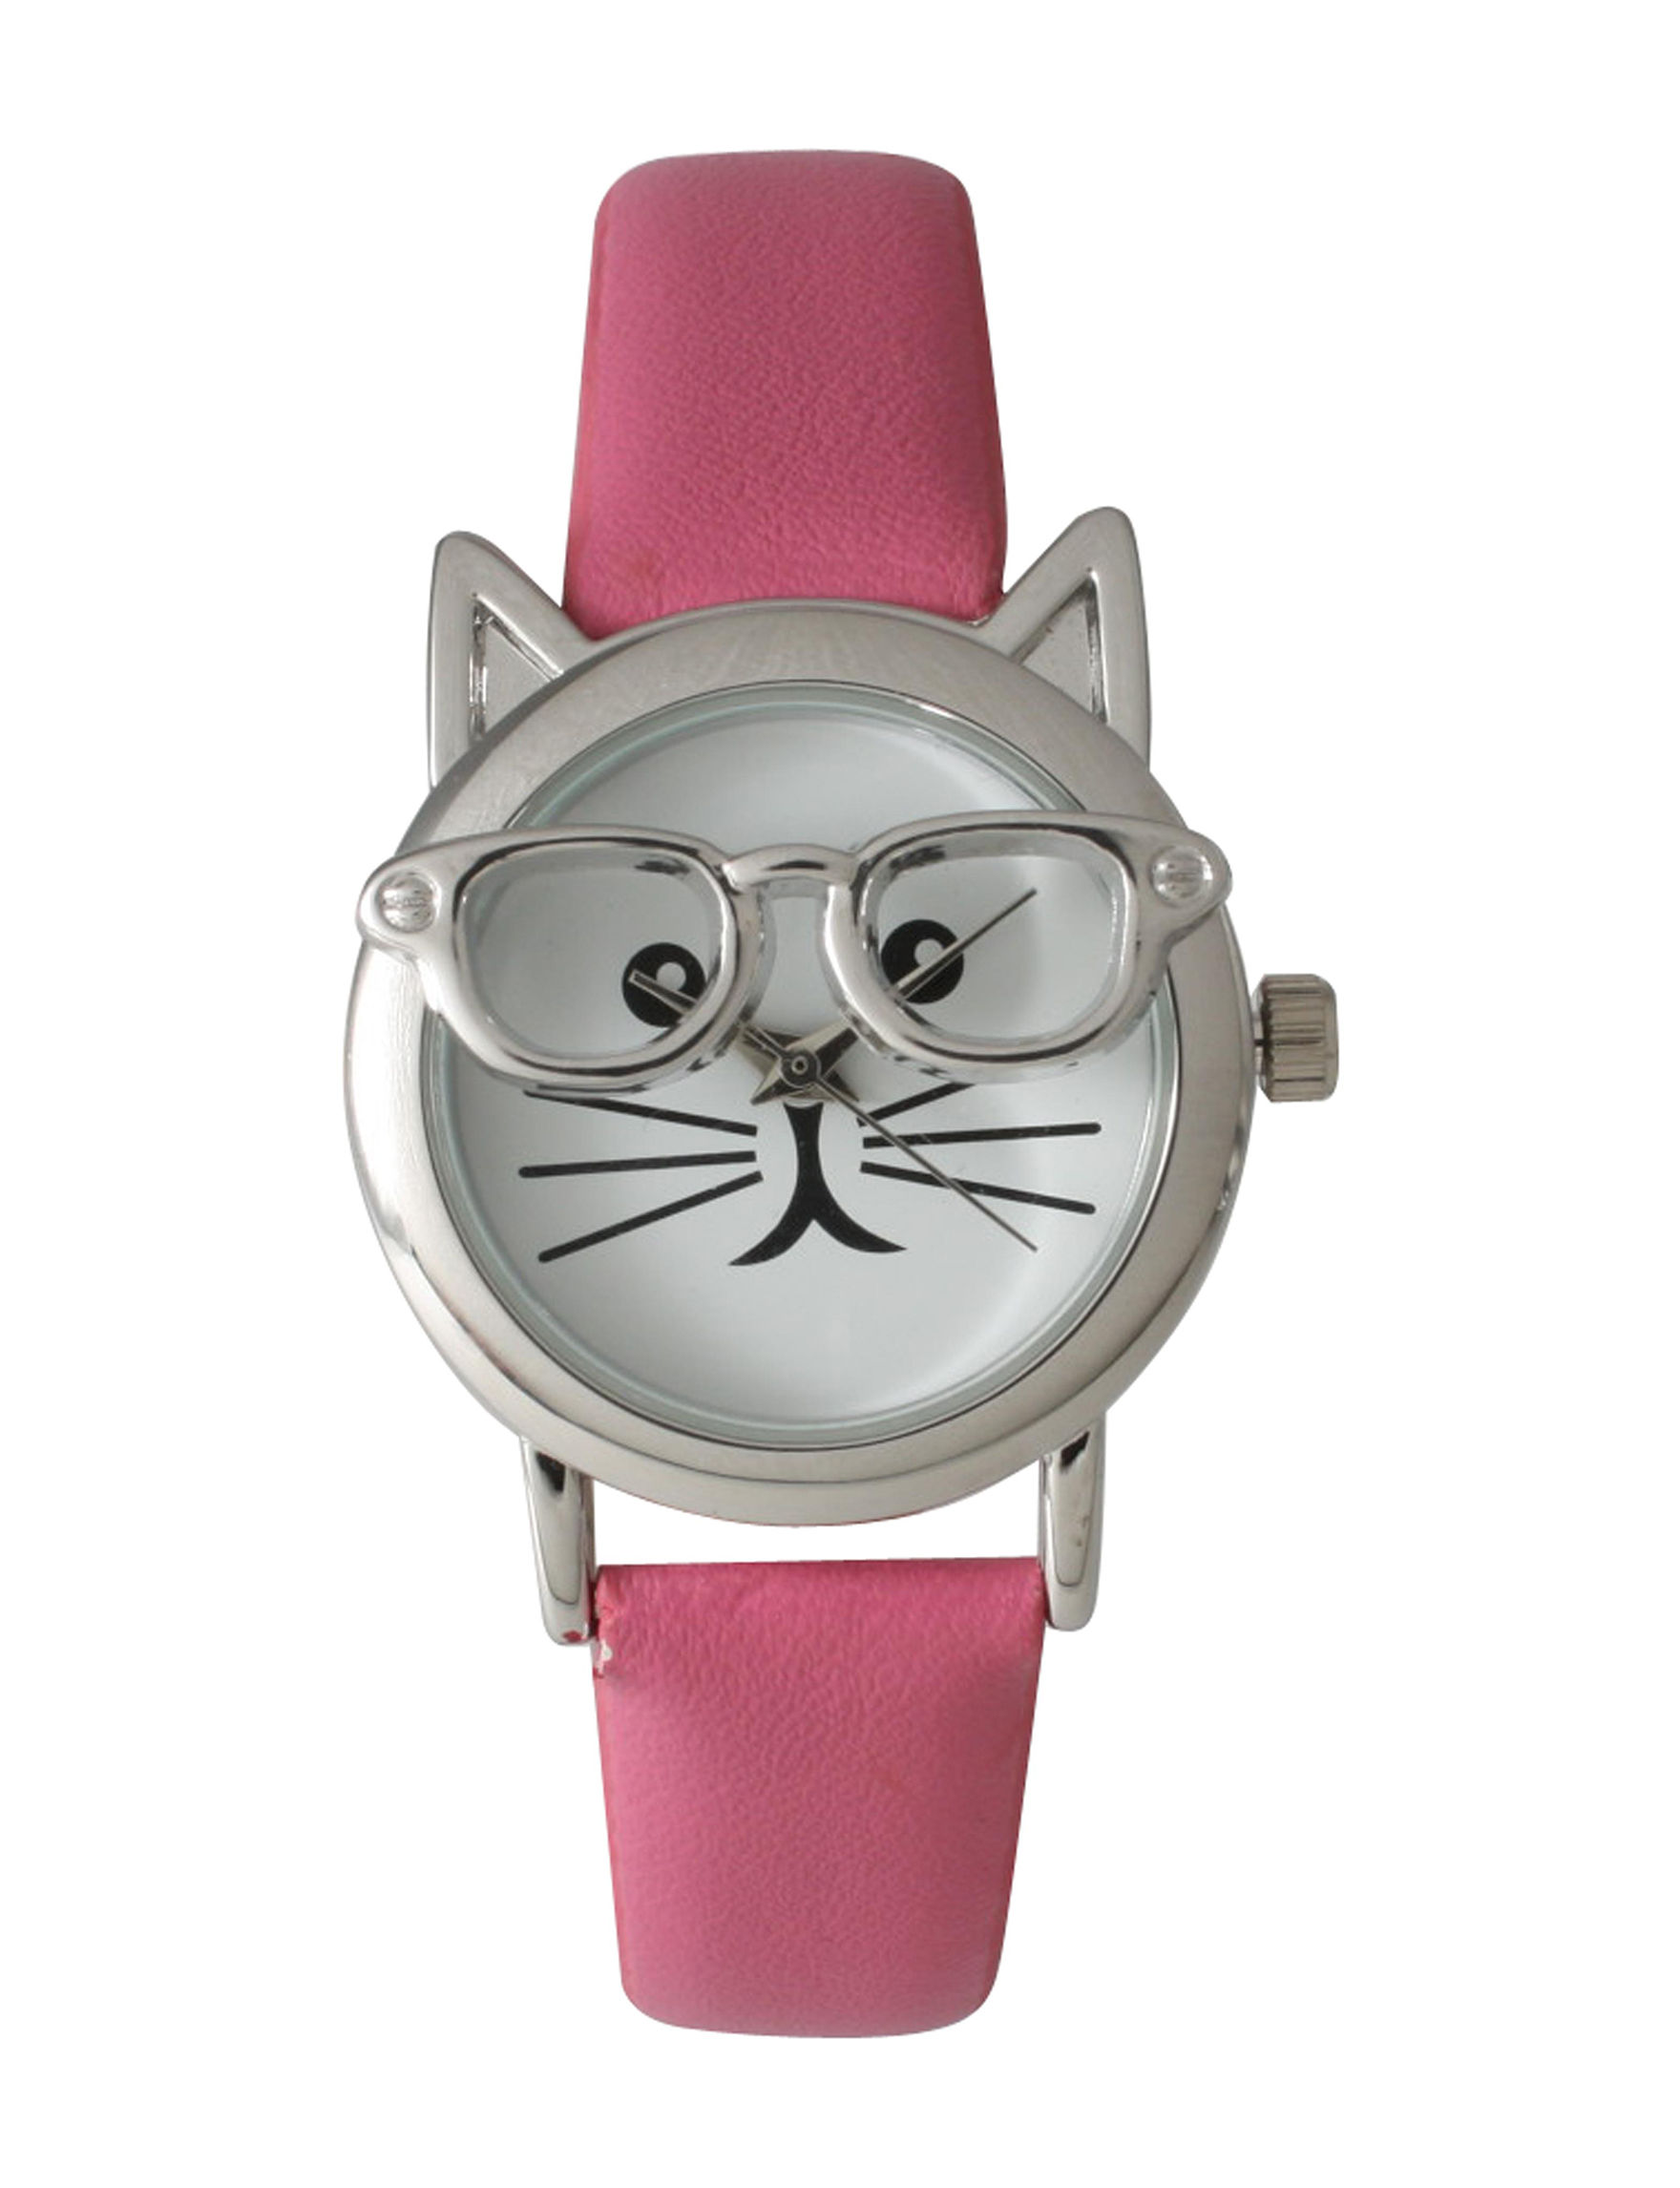 Olivia Pratt Hot Pink Fashion Watches